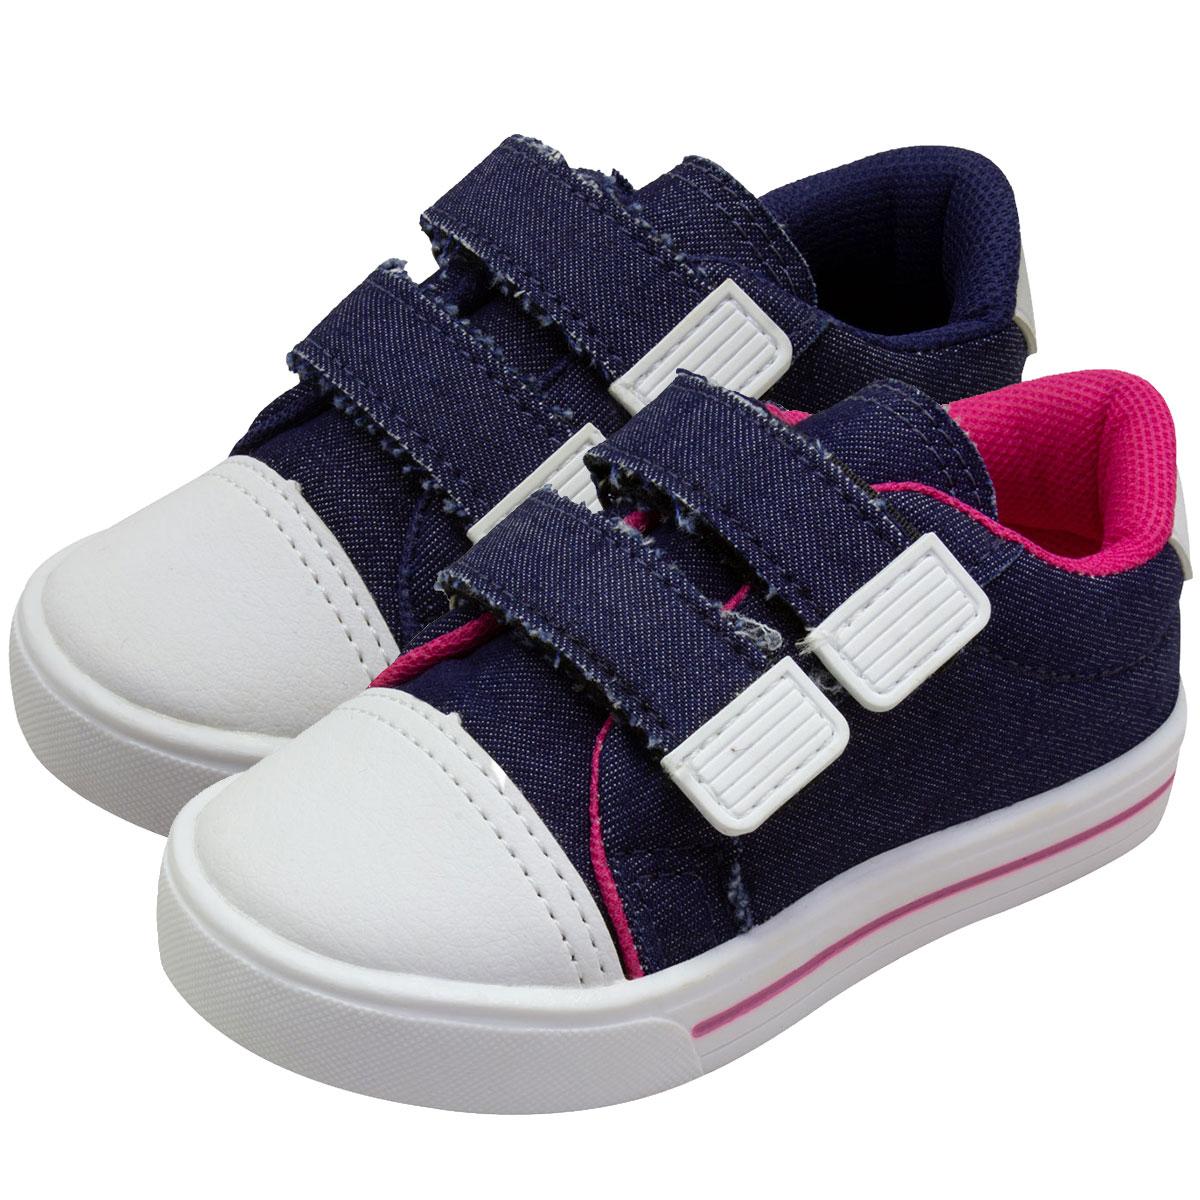 Tênis Infantil Itra Casual Jeans Veste Fácil